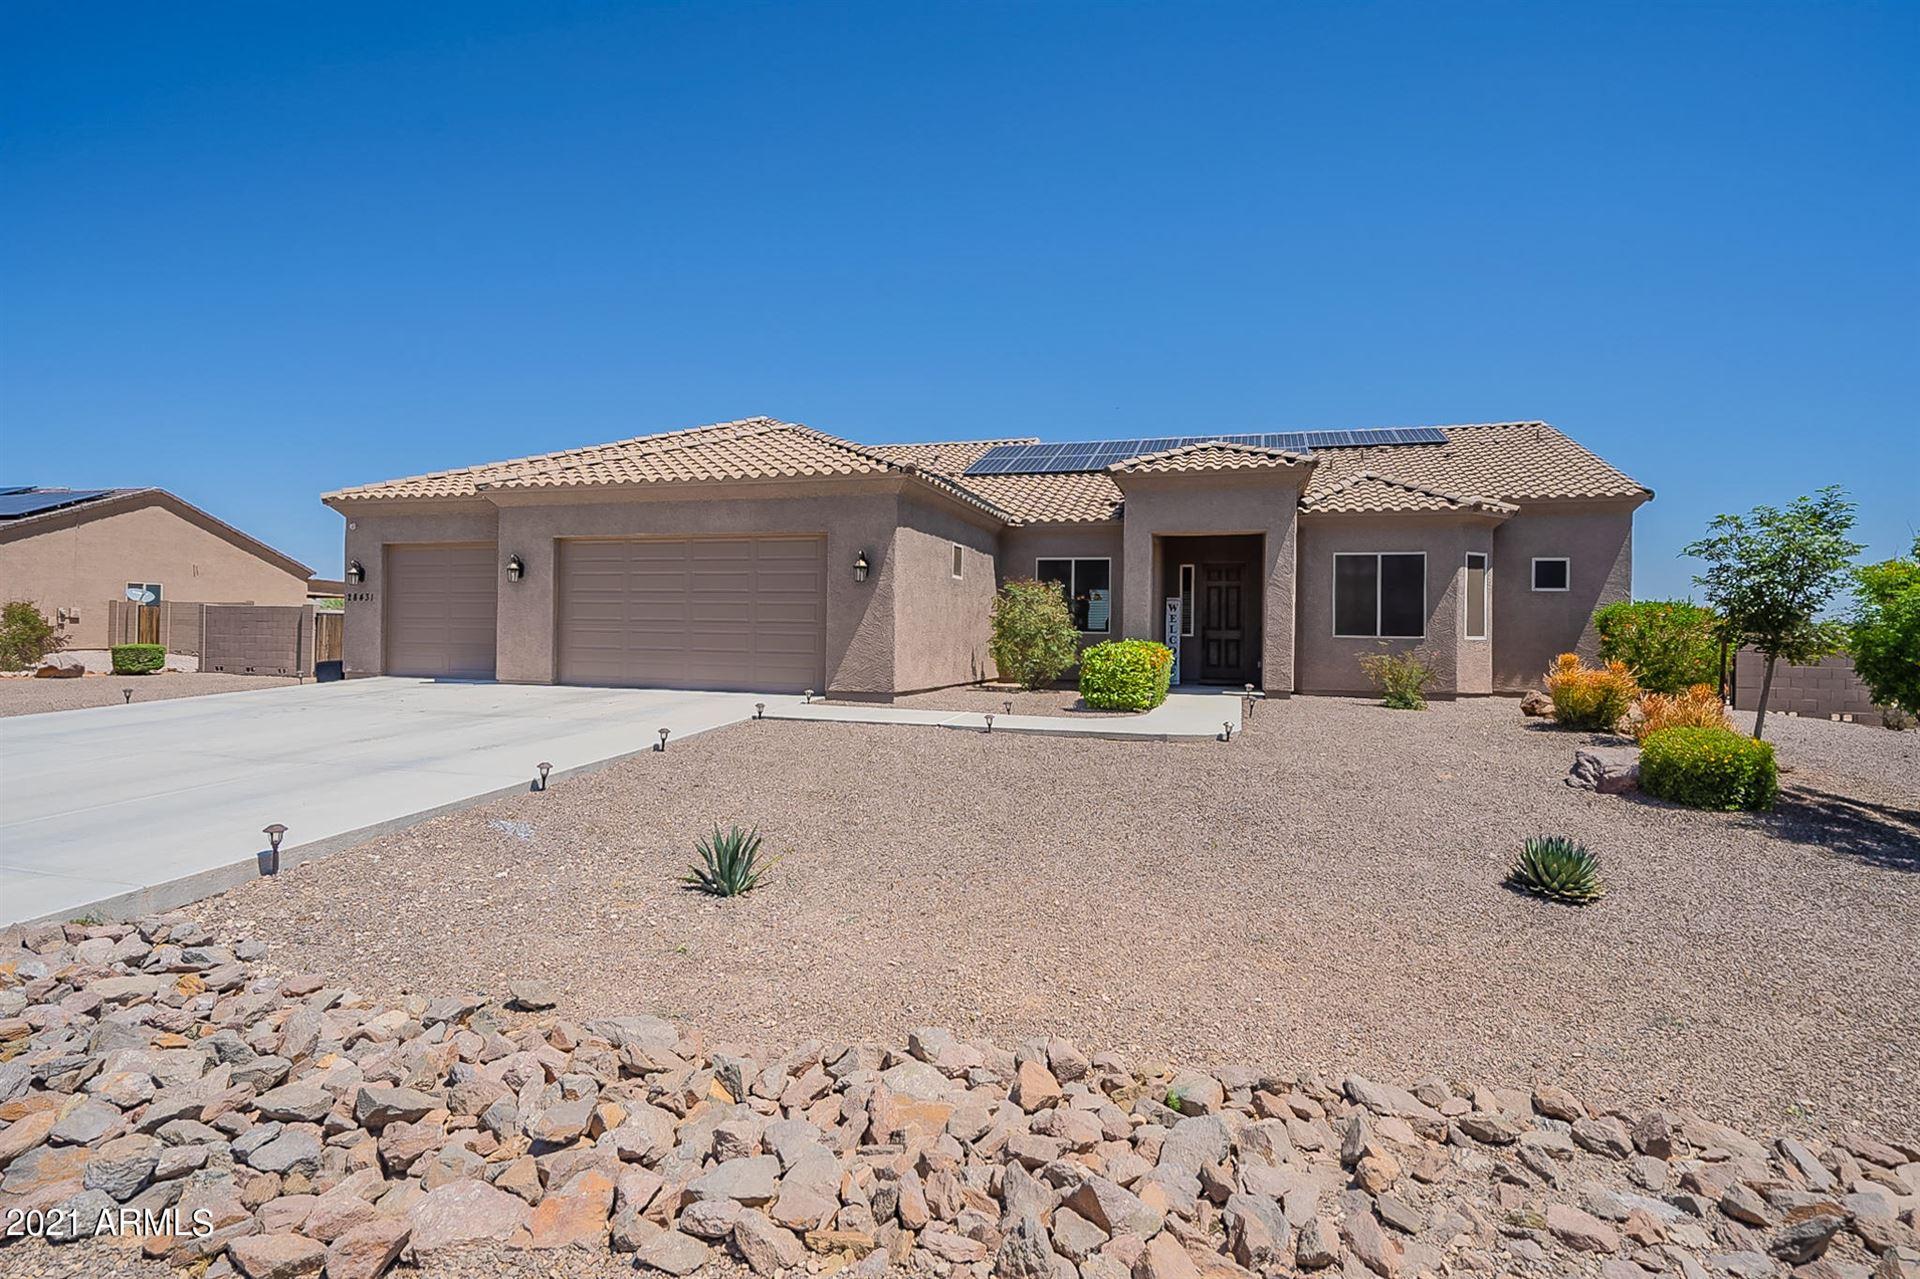 Photo of 28431 N BUSH Street, Wittmann, AZ 85361 (MLS # 6225366)